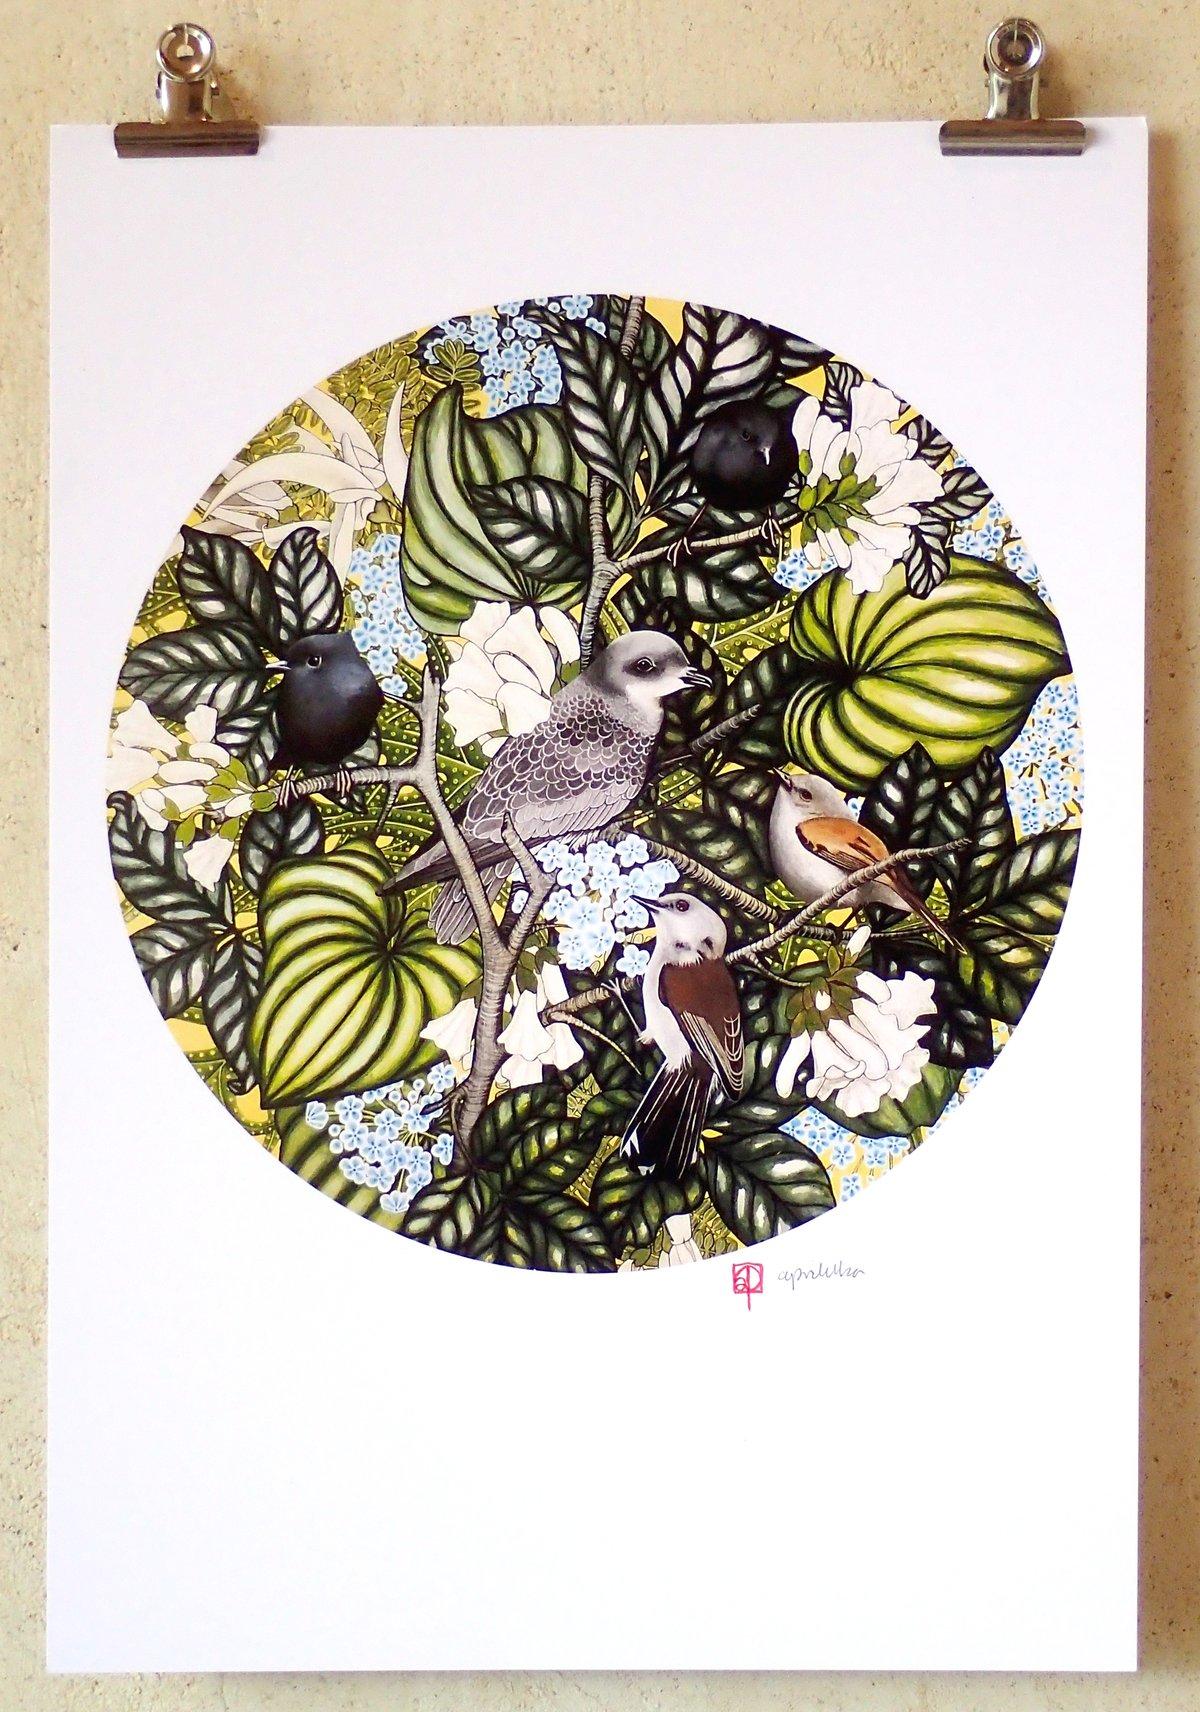 'Chatham Islands Ecosystem' A3 Print